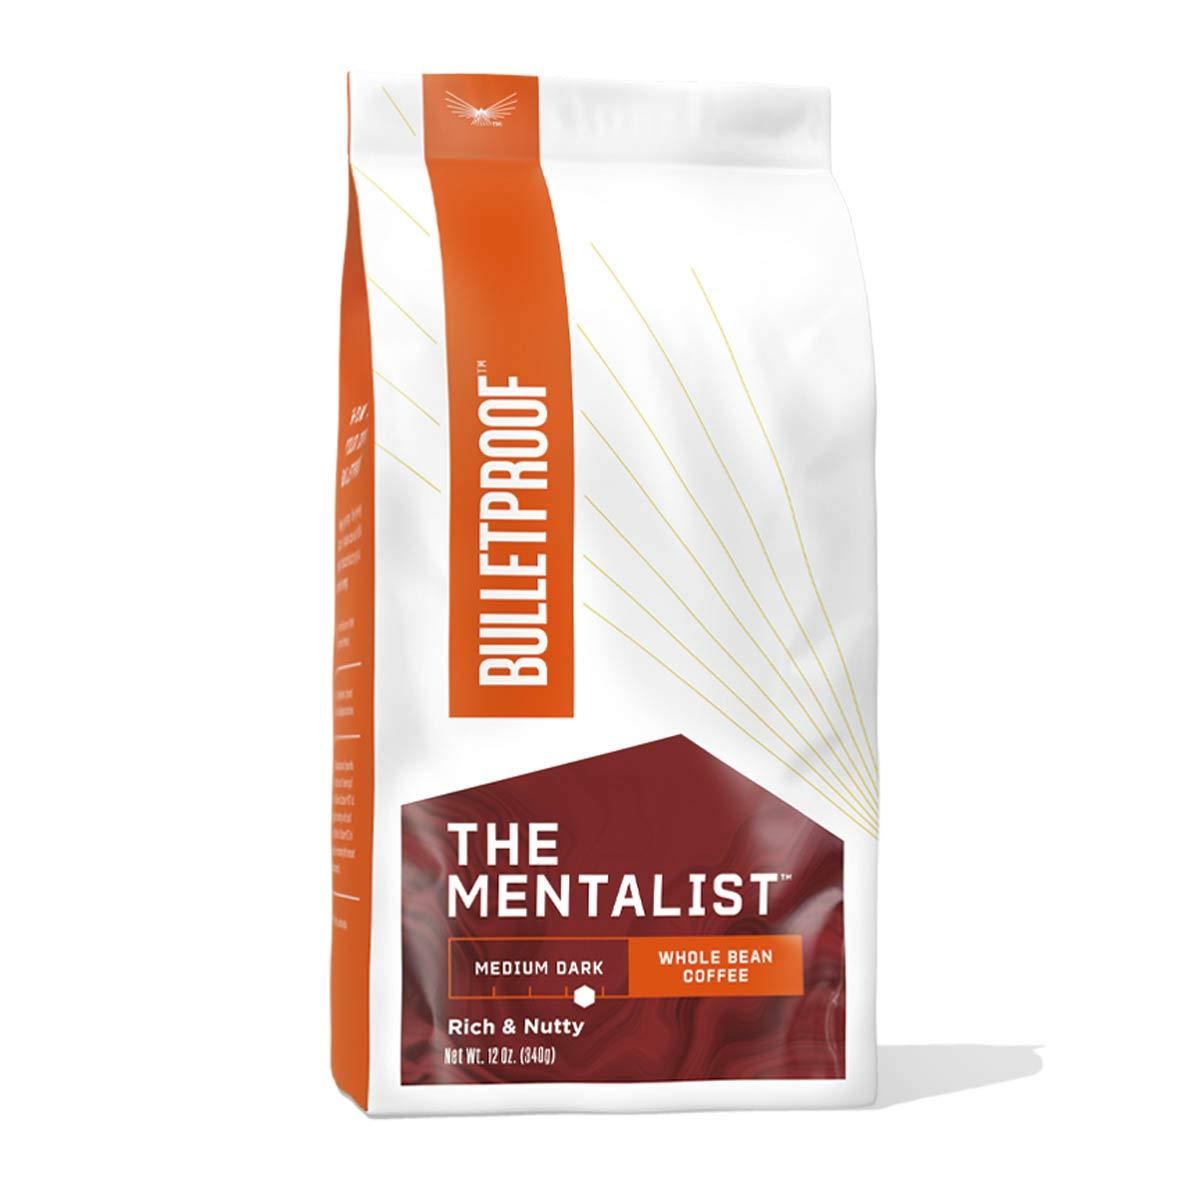 The Mentalist Whole Bean Coffee, Medium Dark Roast, 12 Oz, Bulletproof Keto Friendly 100% Arabica Coffee, Certified Clean Coffee, Rainforest Alliance, Sourced from Guatemala, Colombia & Brazil